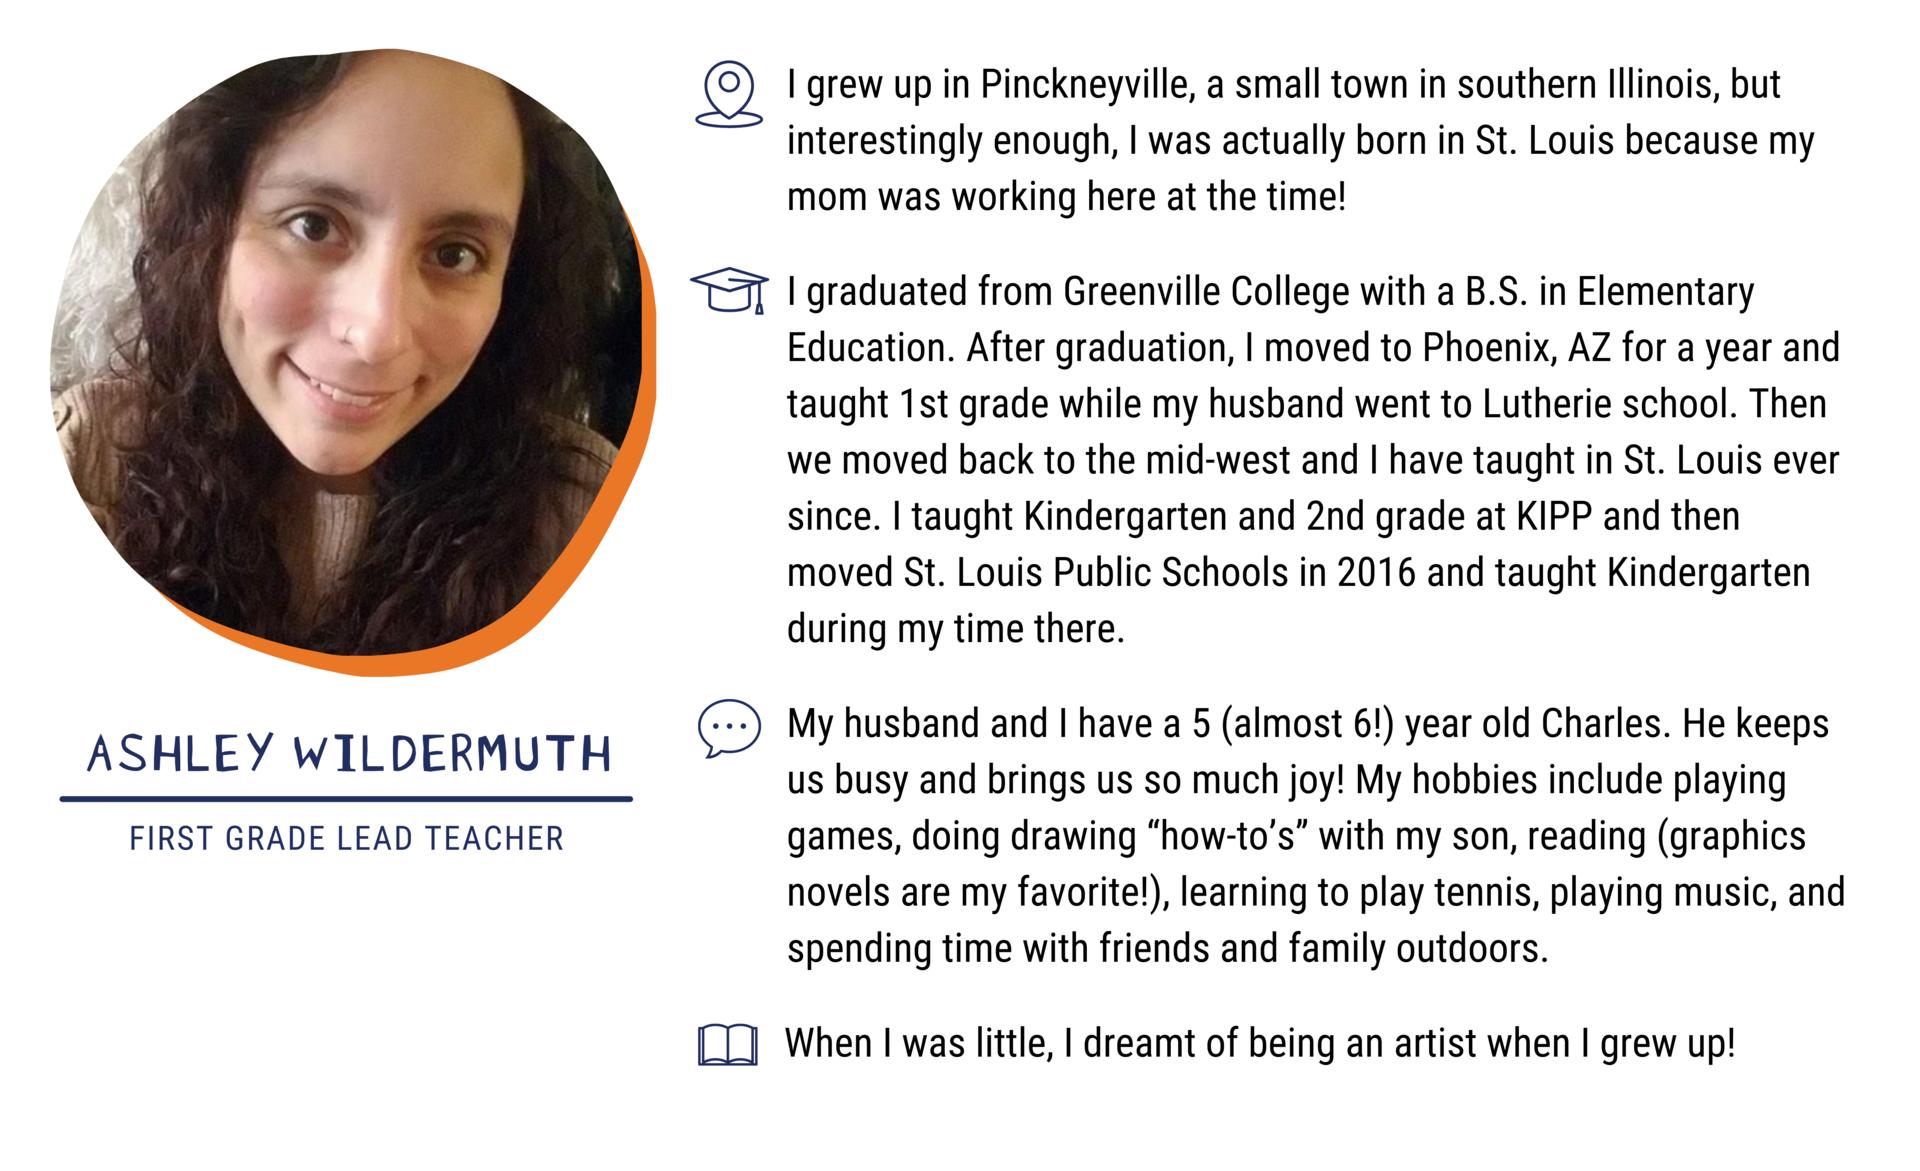 Ashley Wildermuth, First Grade